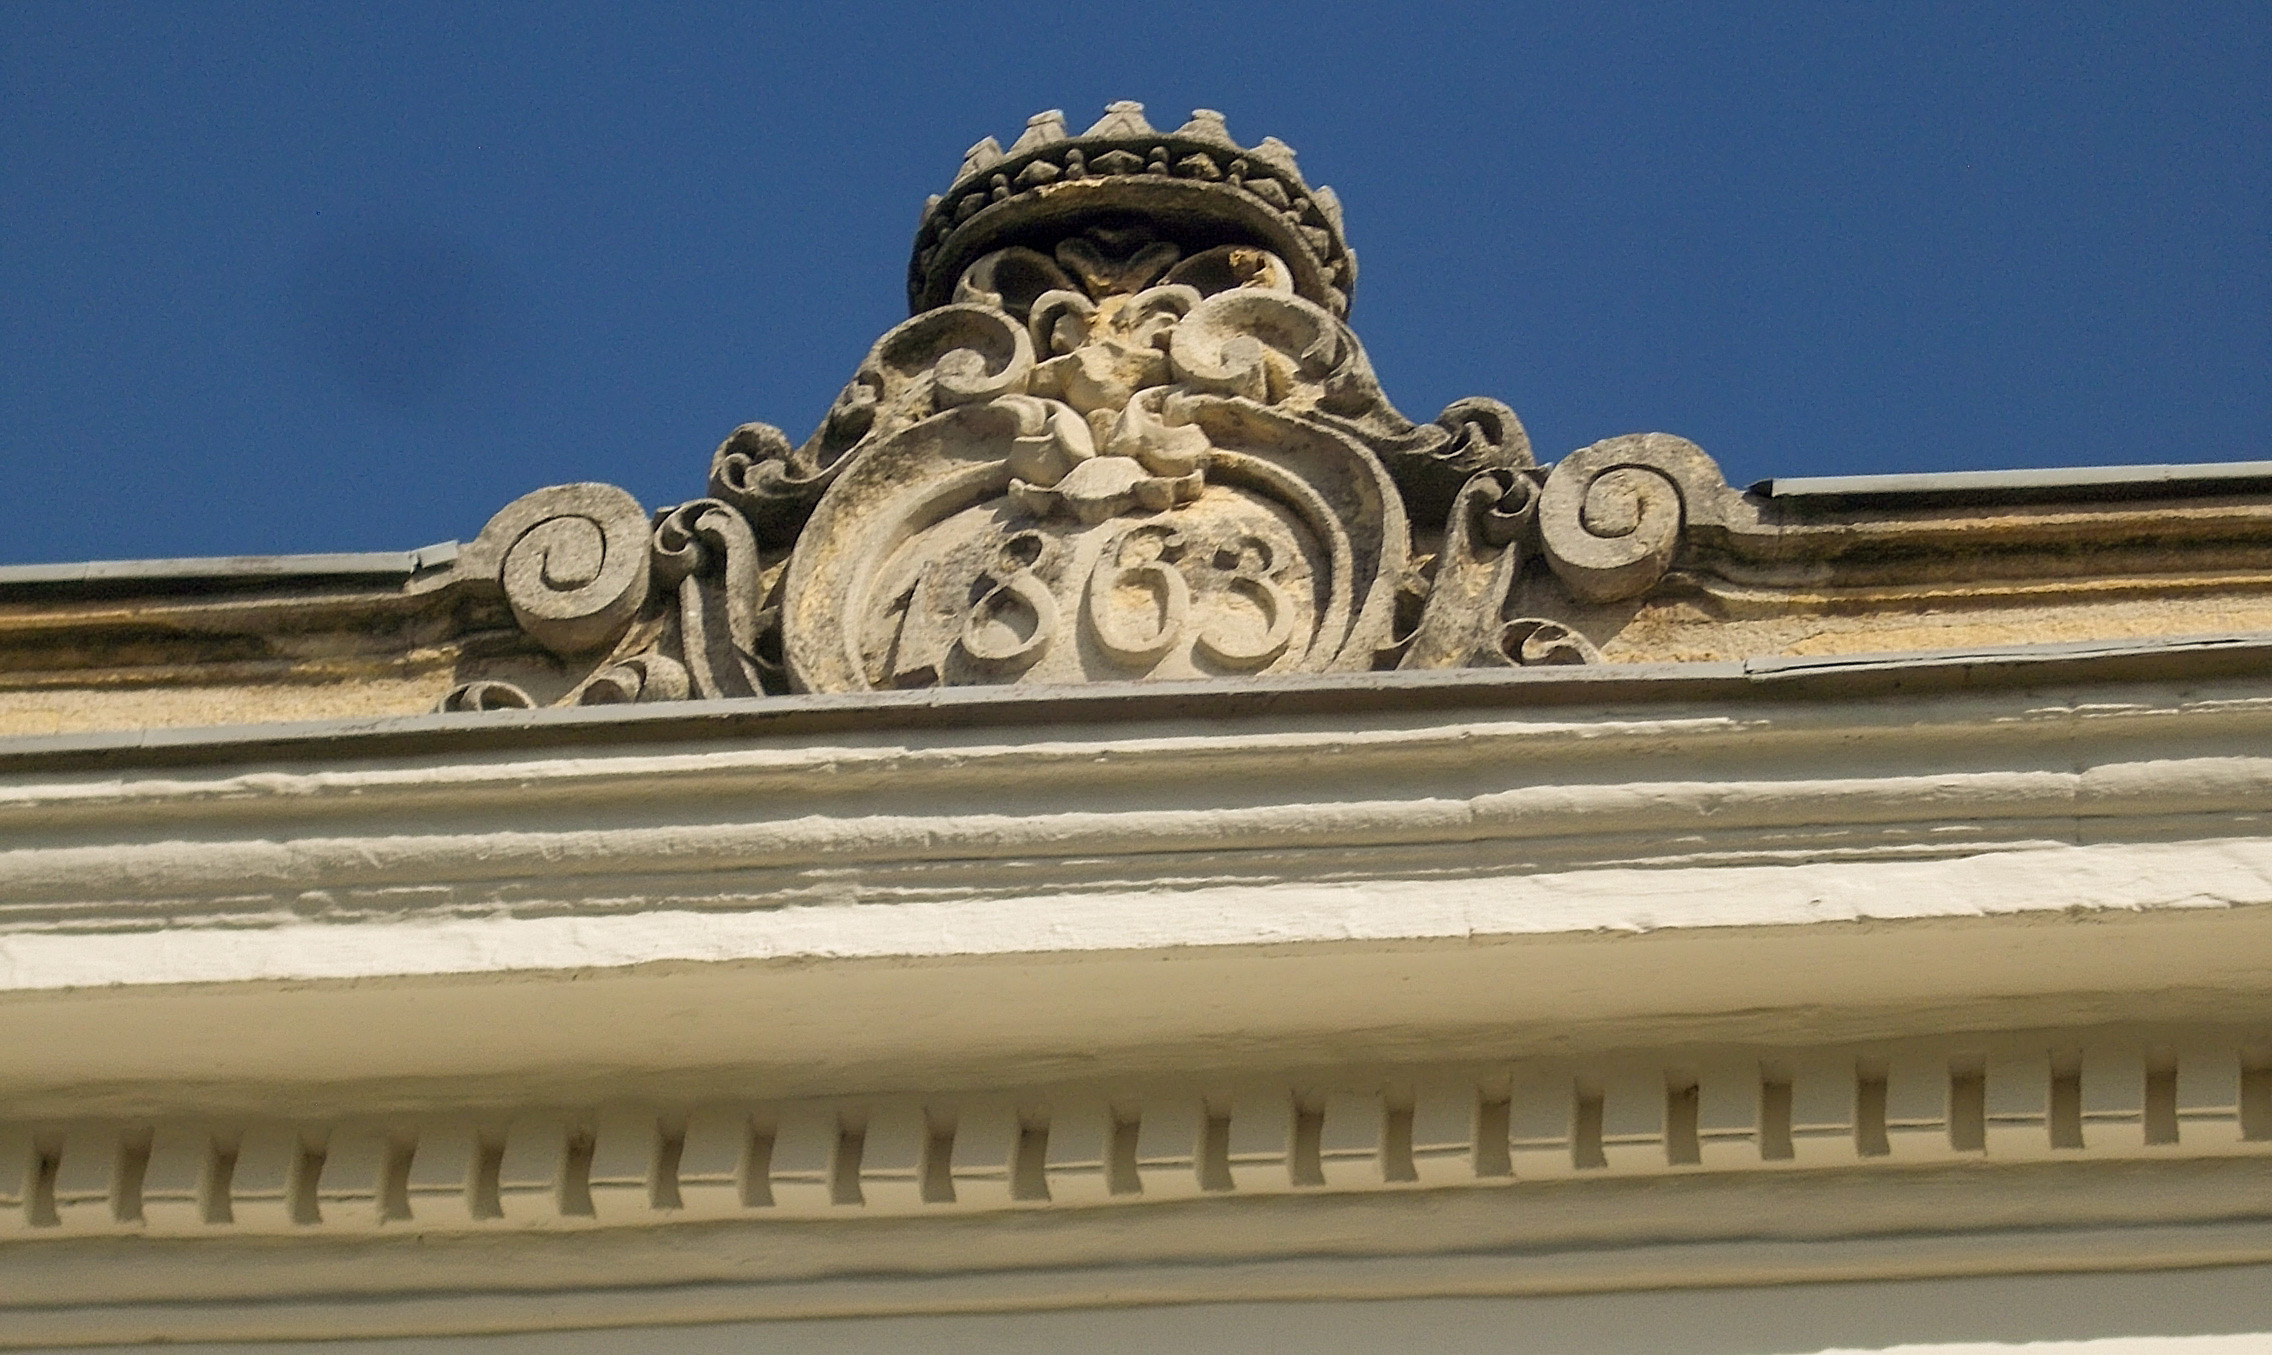 zichy_mansion_west_architectural_date_2017_varpalota_wikim_comm_edited.jpg